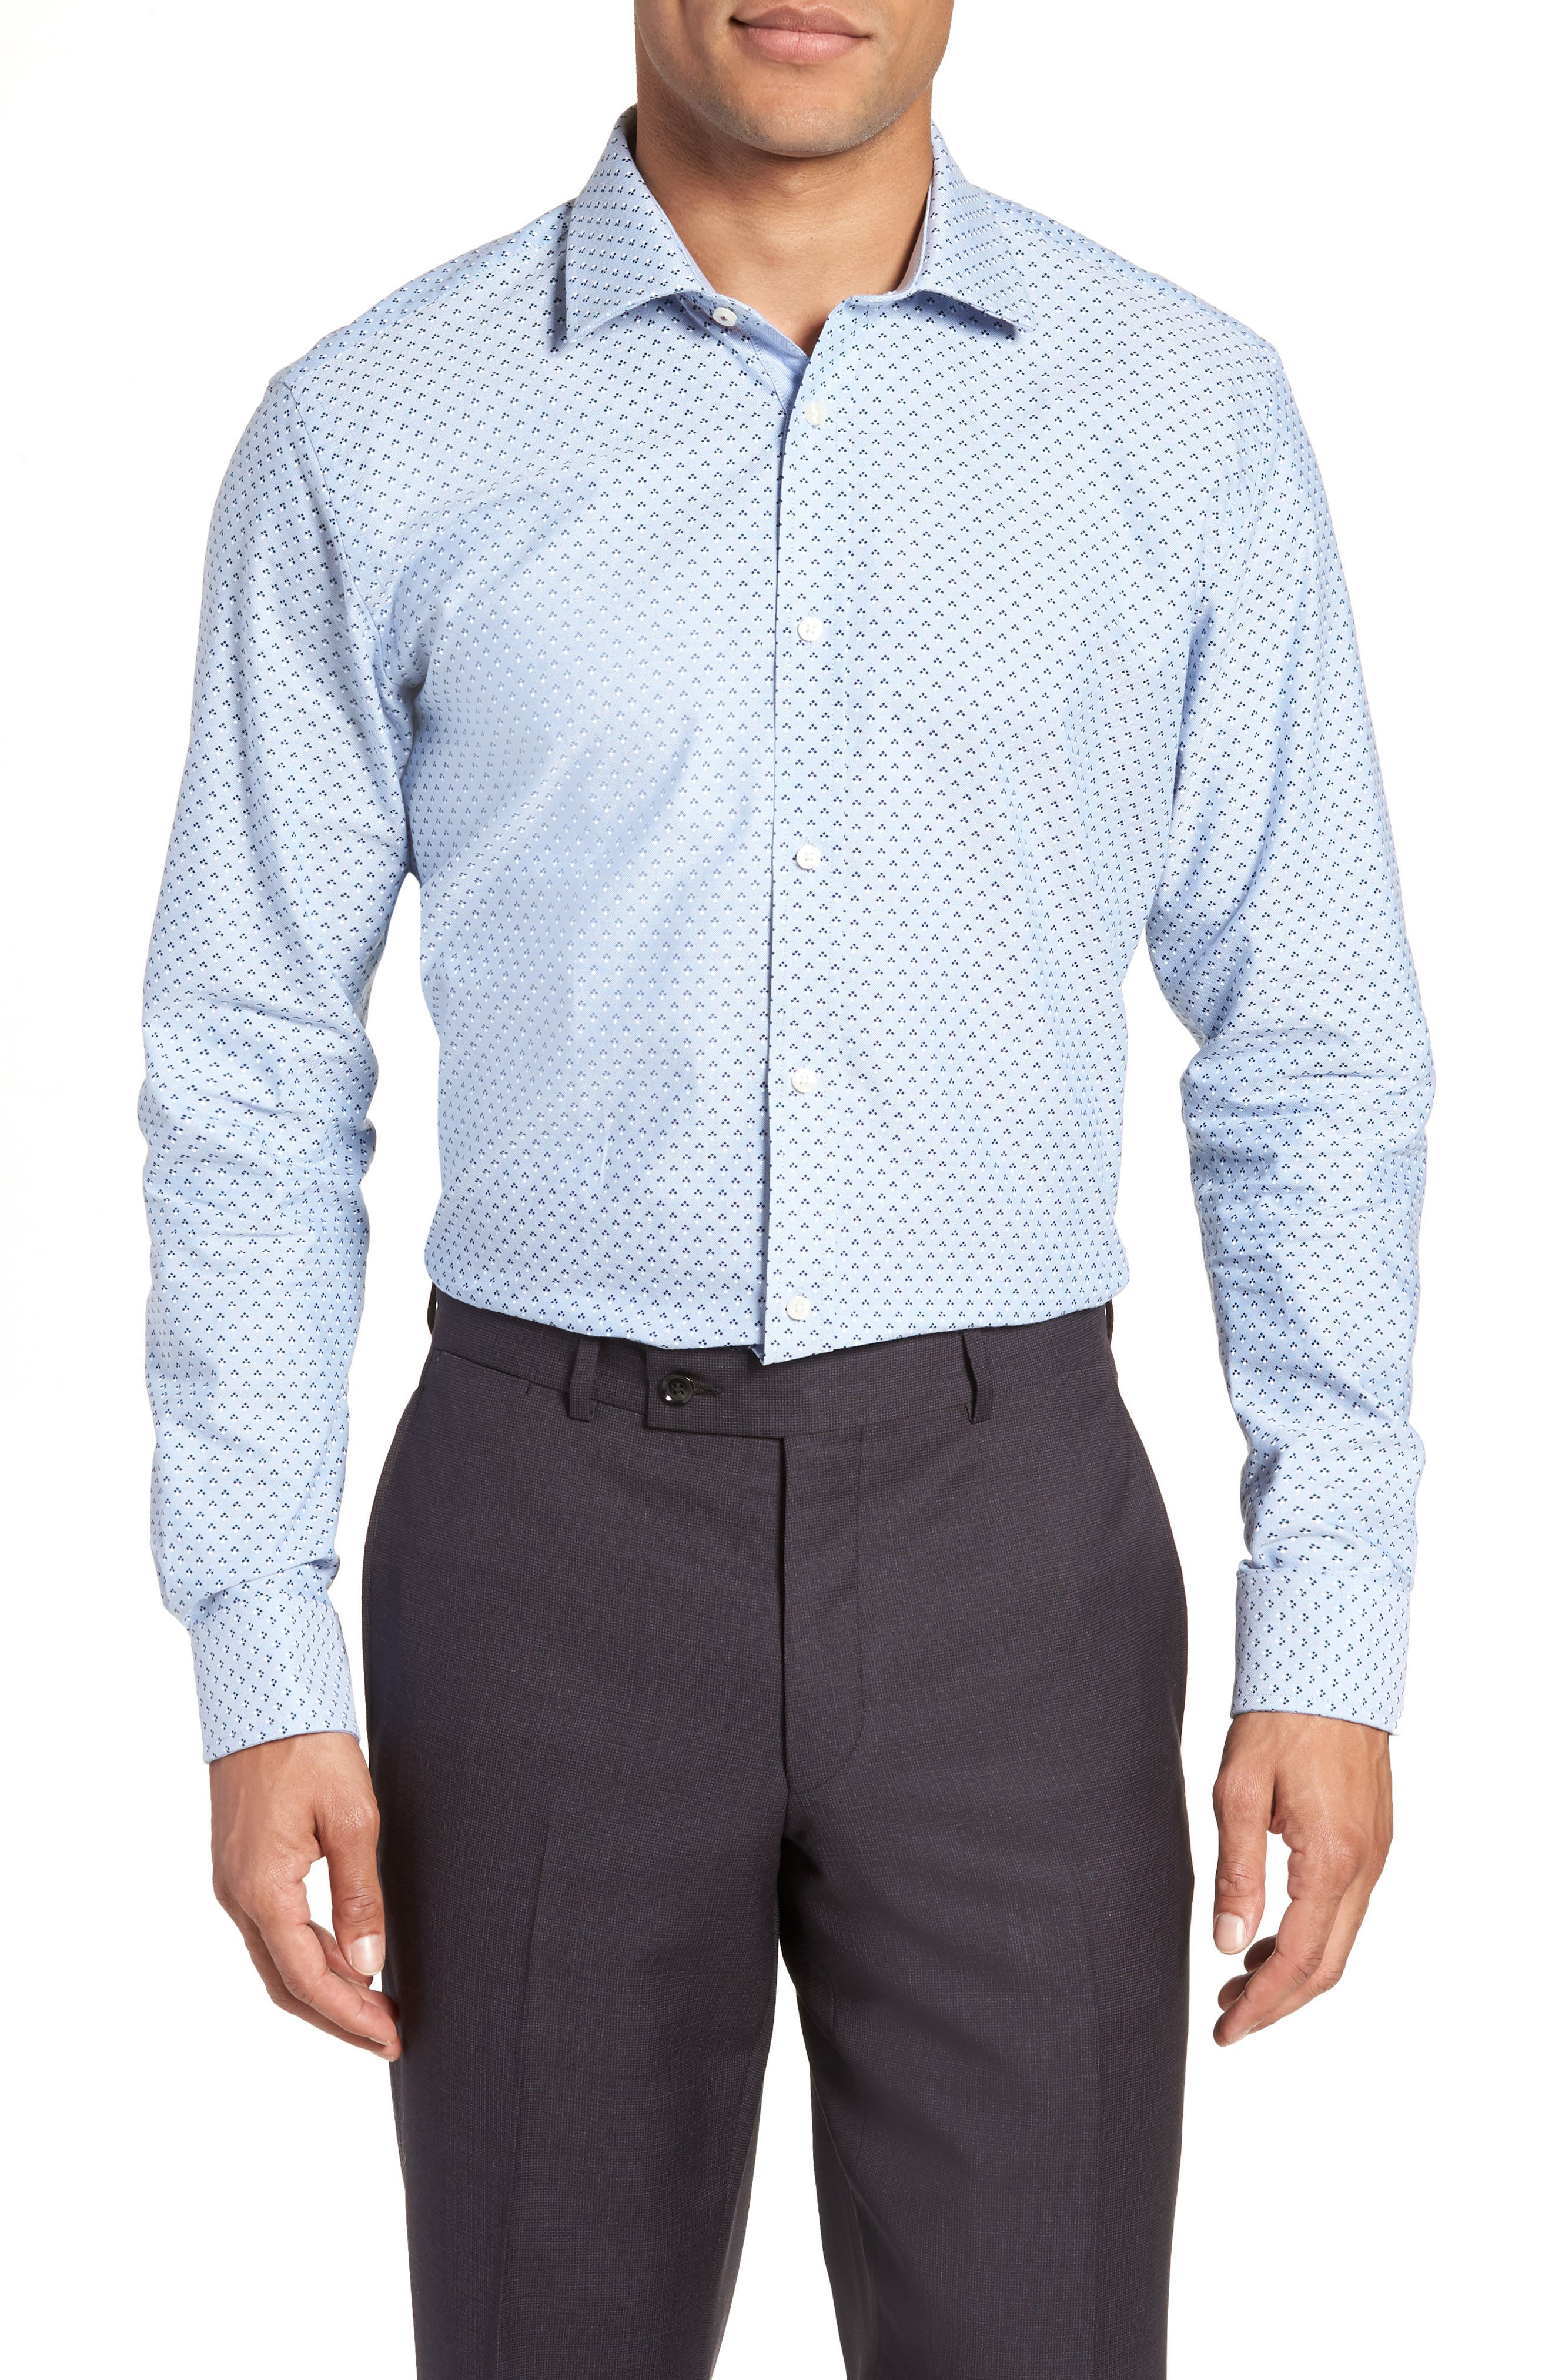 Forestr Trim Fit Geometric Dress Shirt,                         Main,                         color, Blue